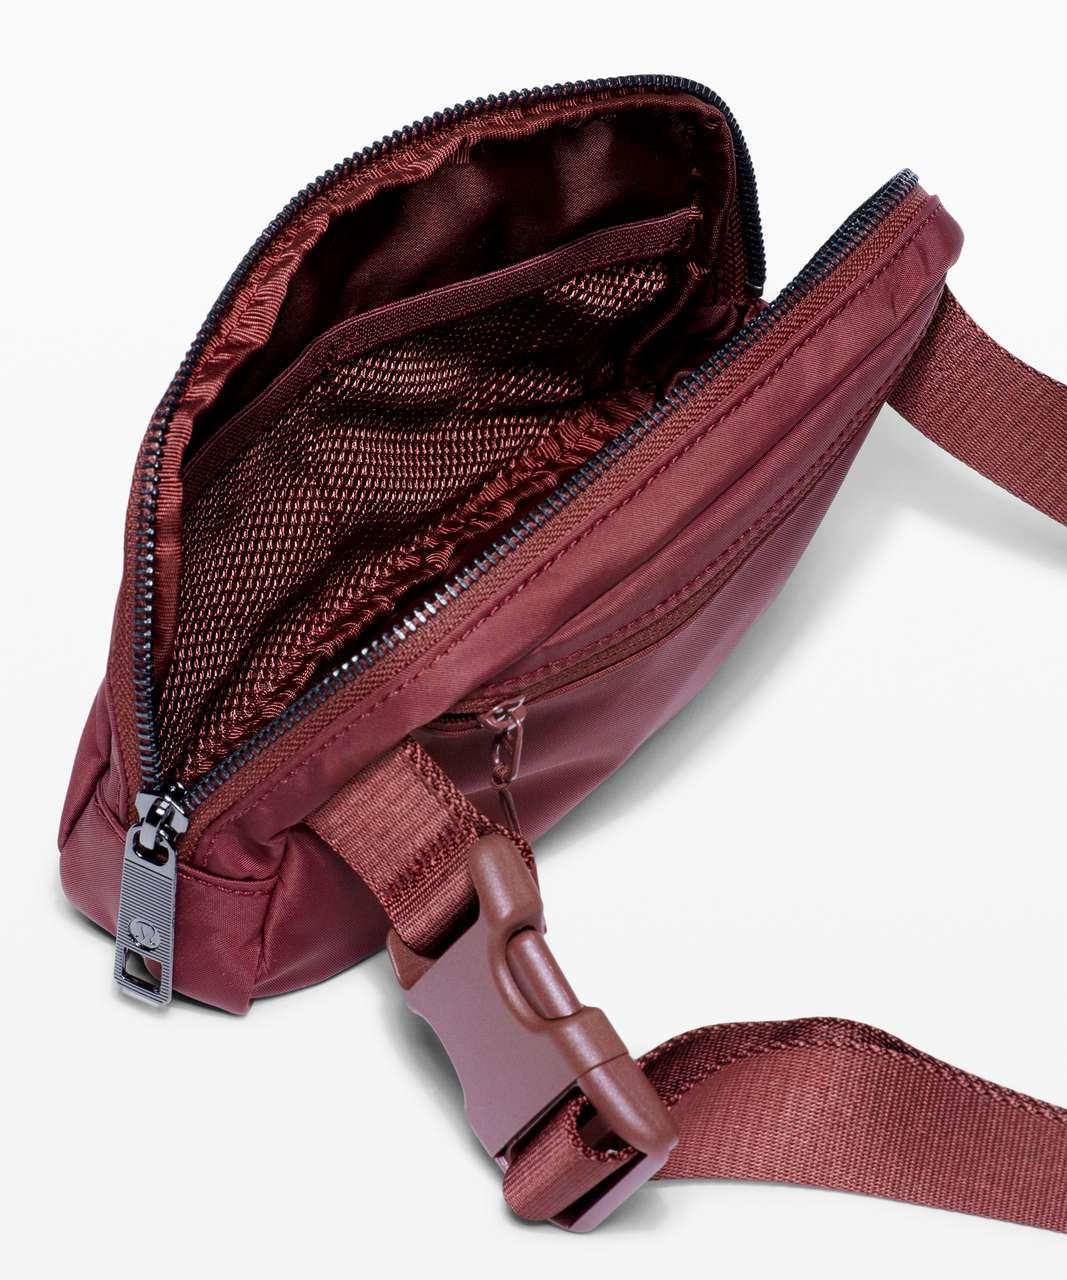 Lululemon Everywhere Belt Bag *1L - Savannah